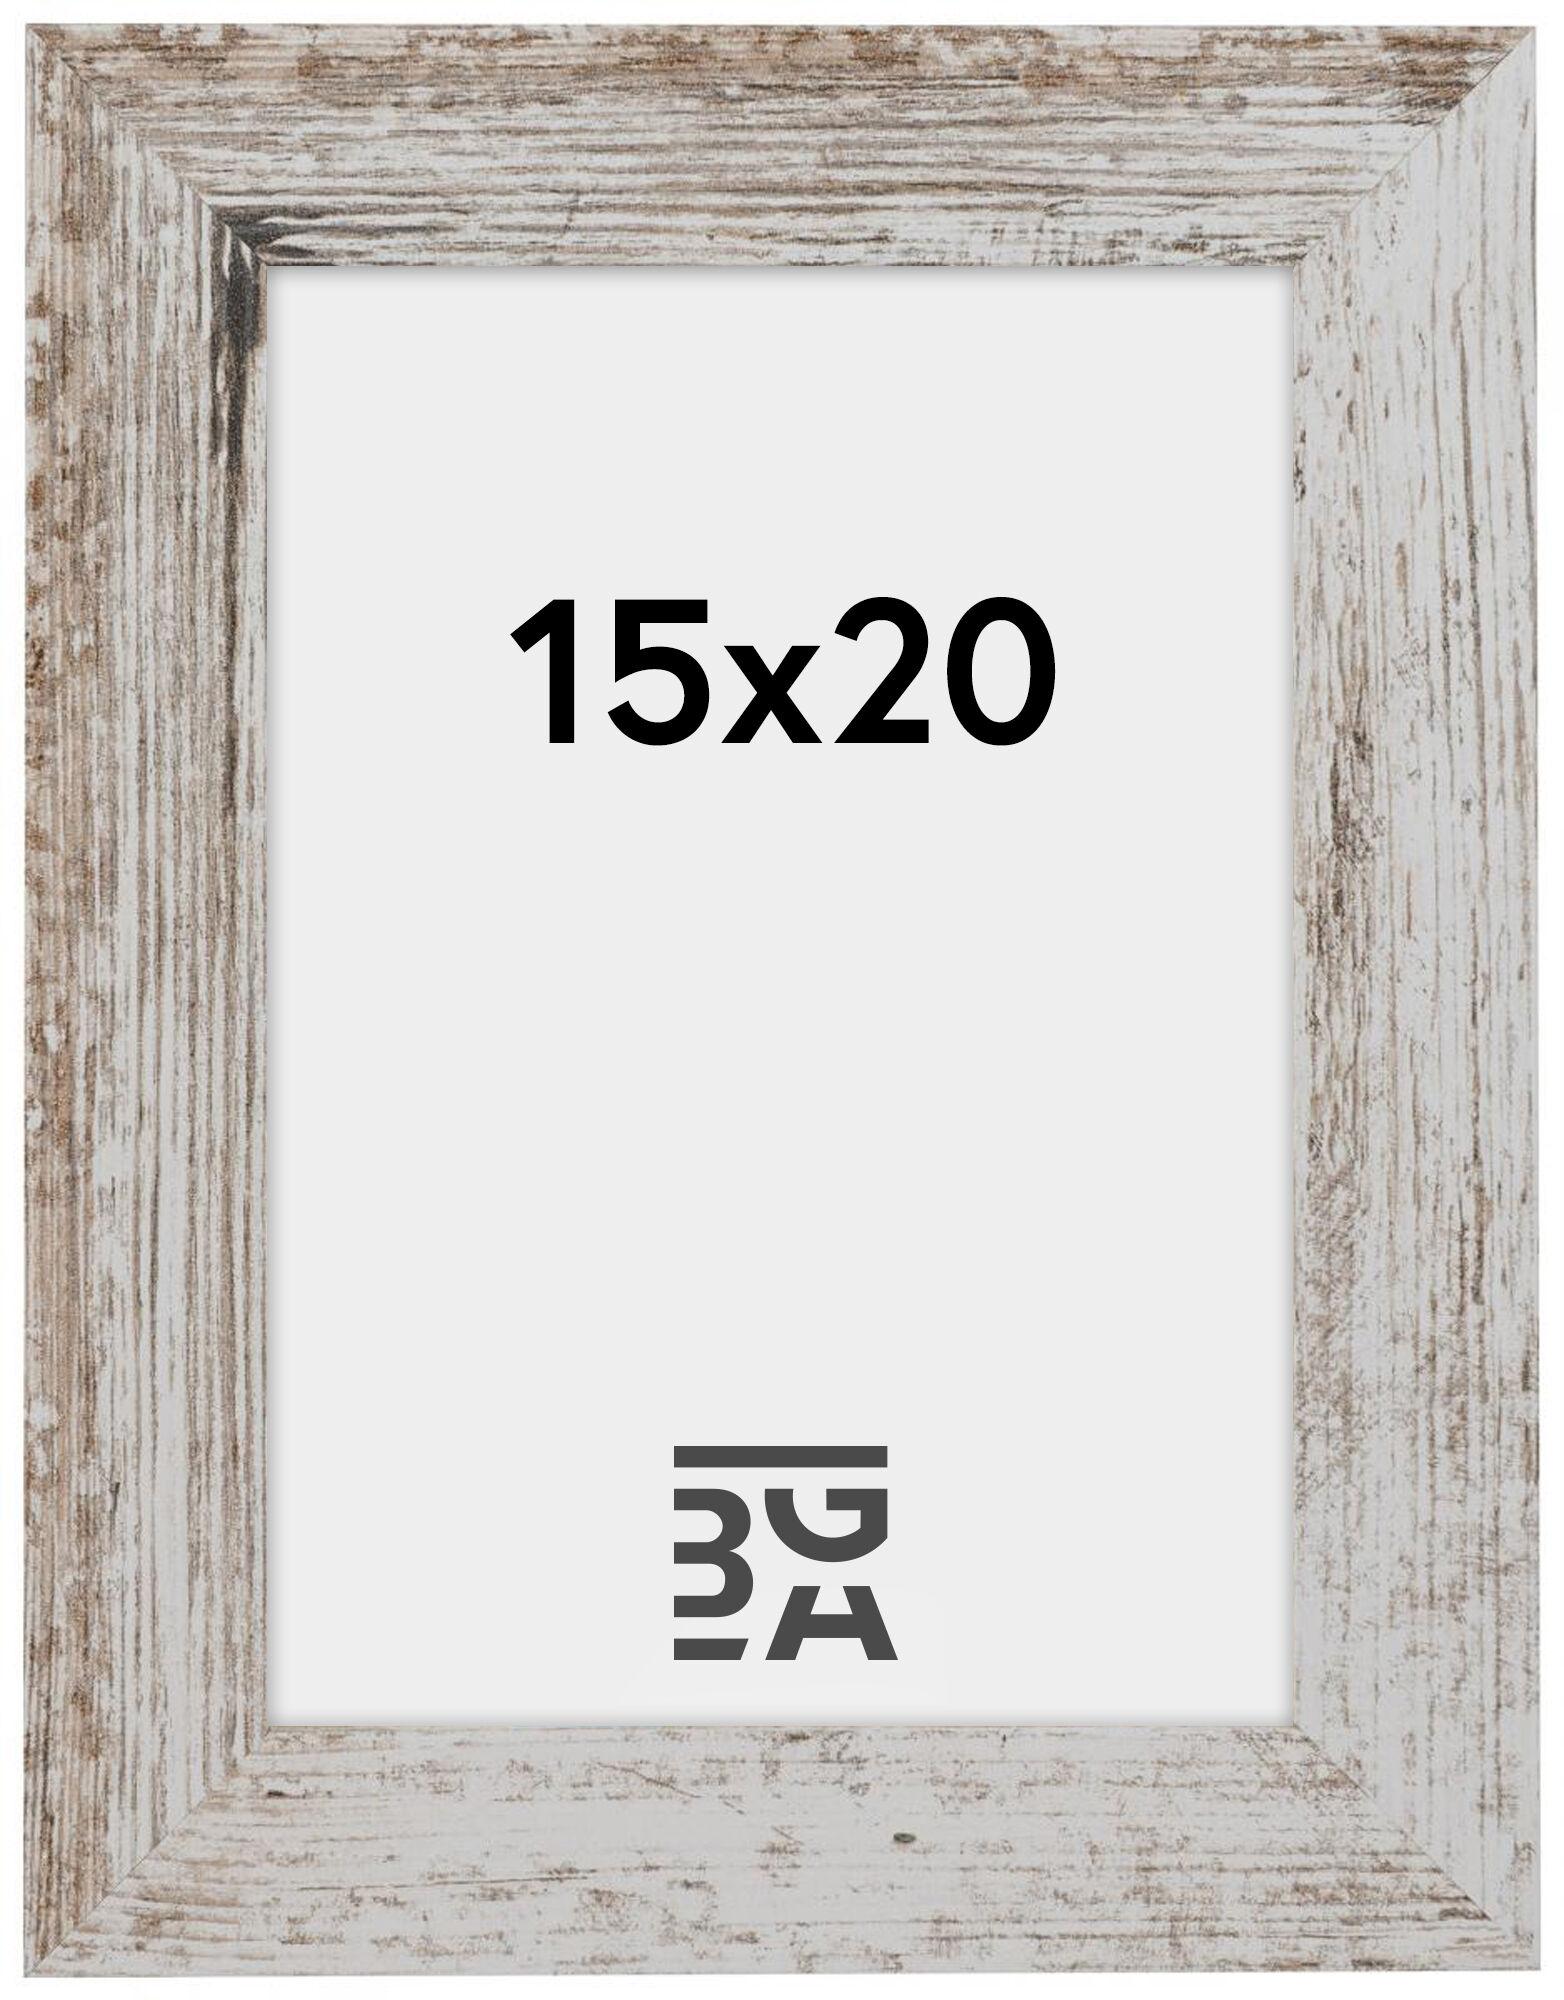 Estancia Superb AA 15x20 cm